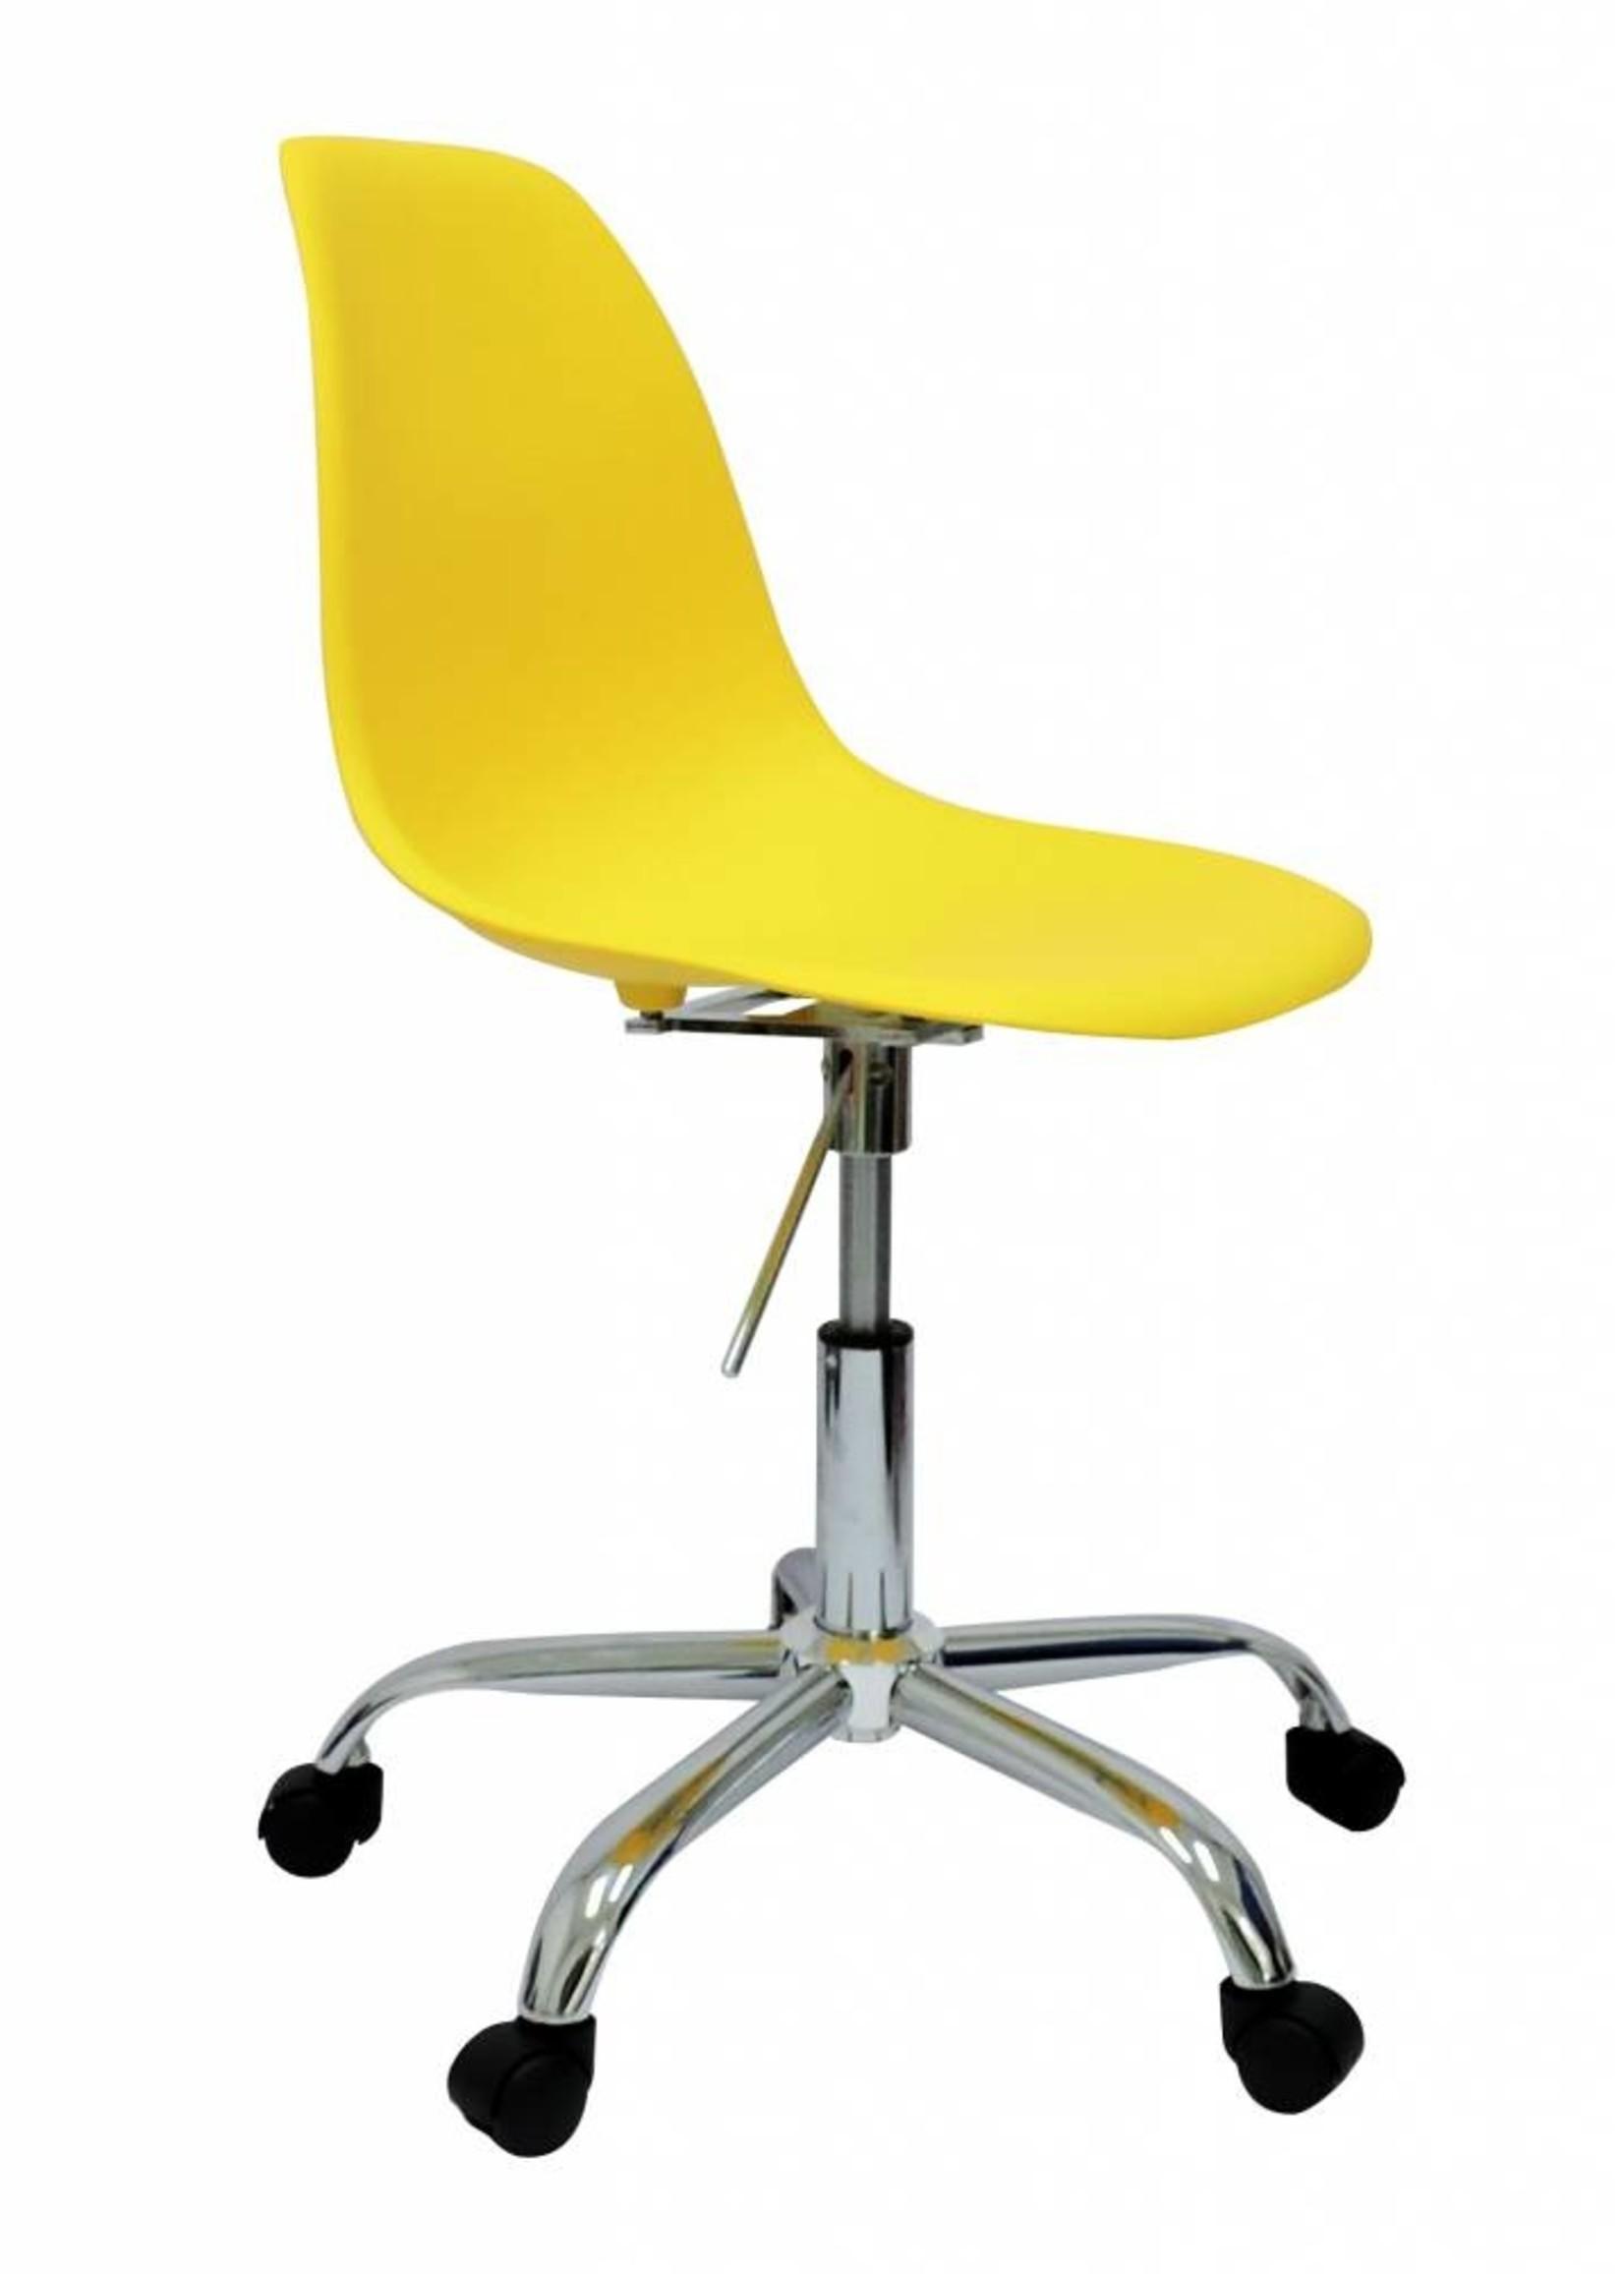 PSCC Eames Design Chair Yellow